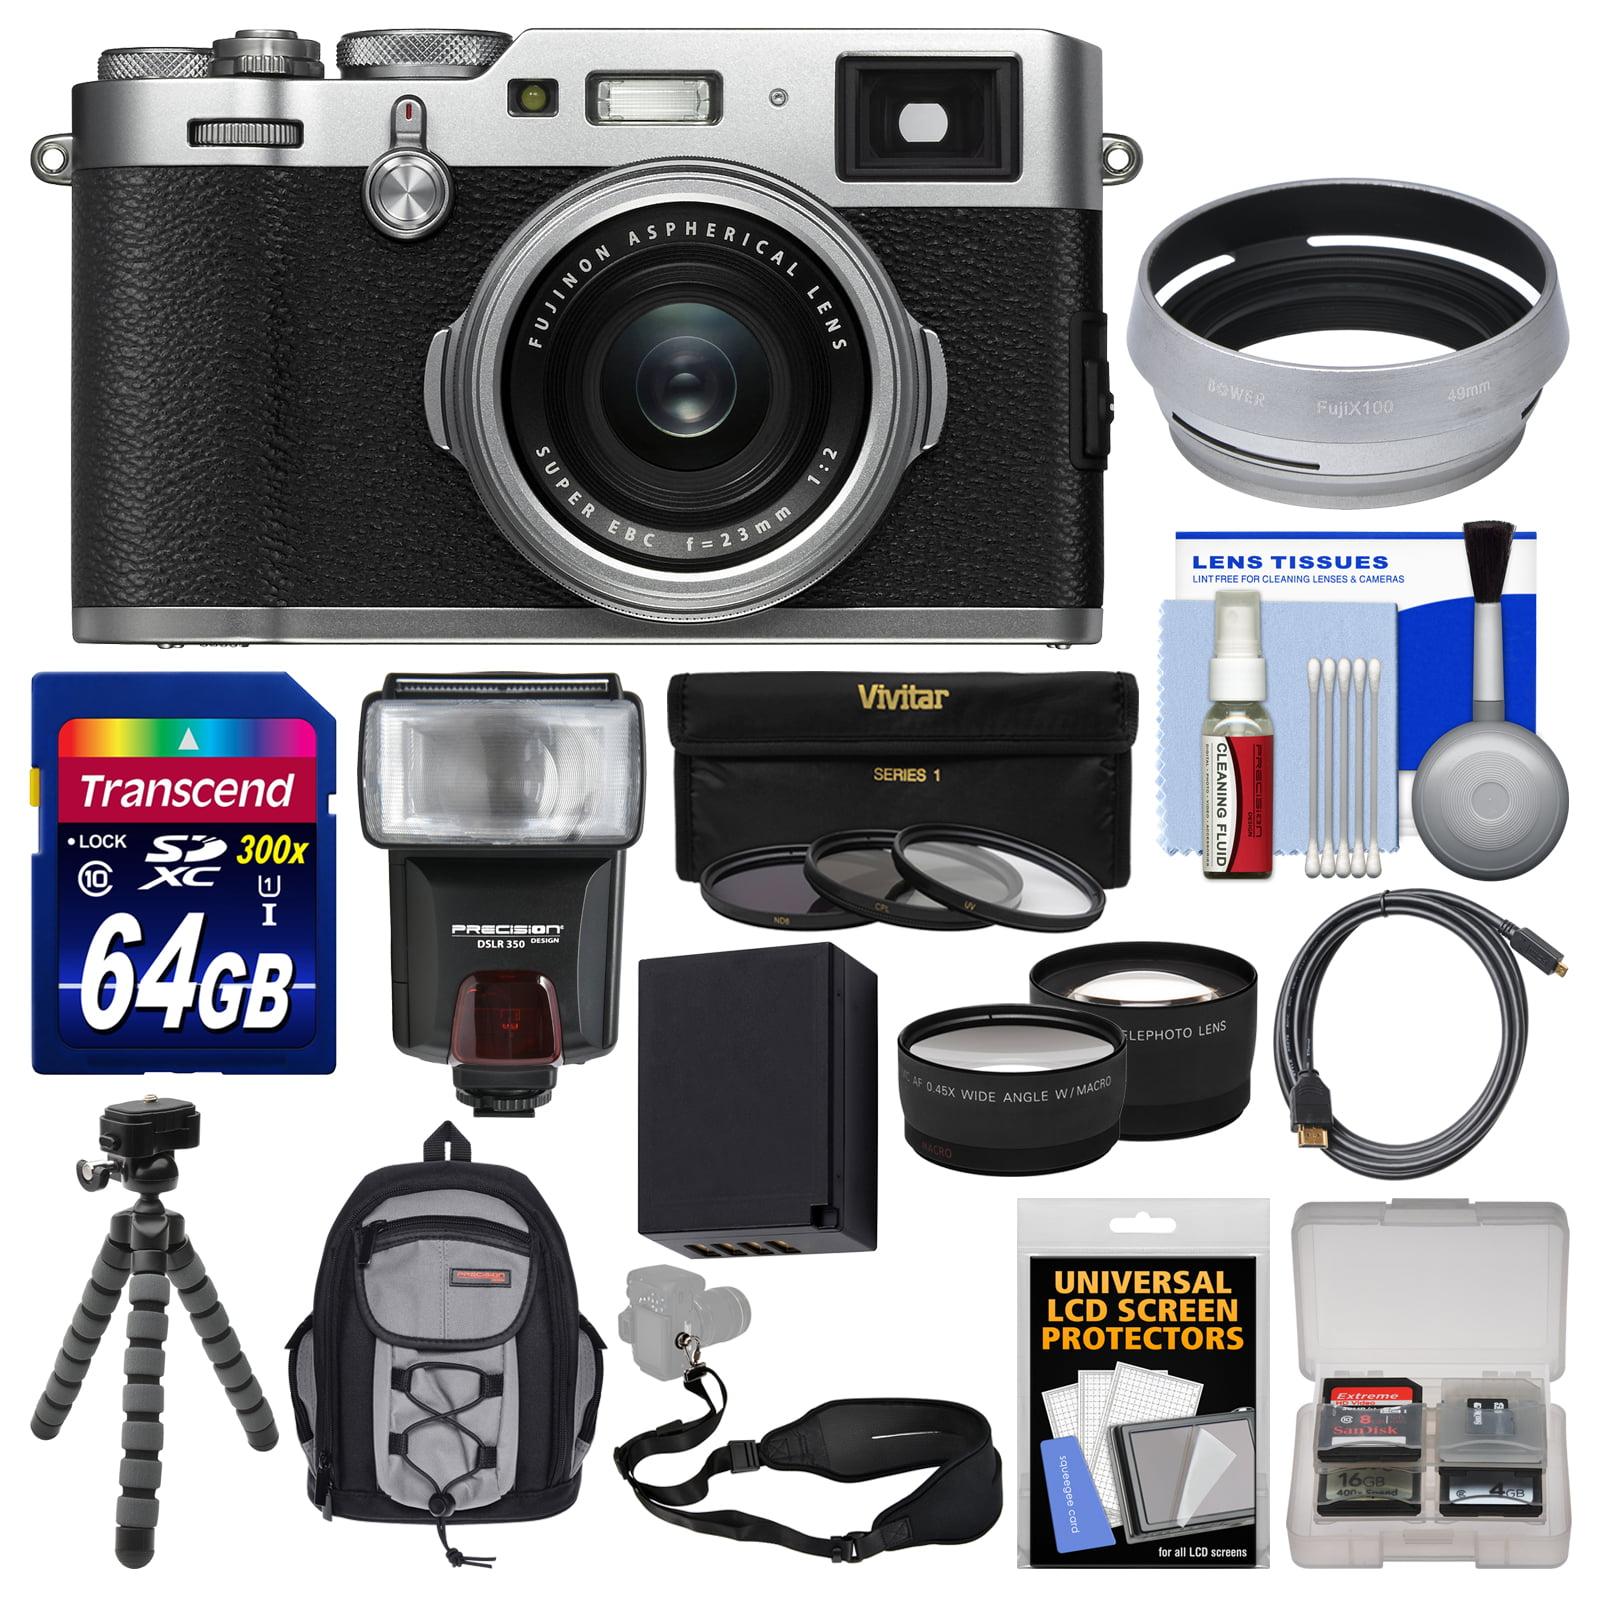 FujiFilm X100F Wi-Fi Digital Camera (Silver) with 64GB Card + Backpack + Battery + Flash + Tripod + Filters +... by Fujifilm